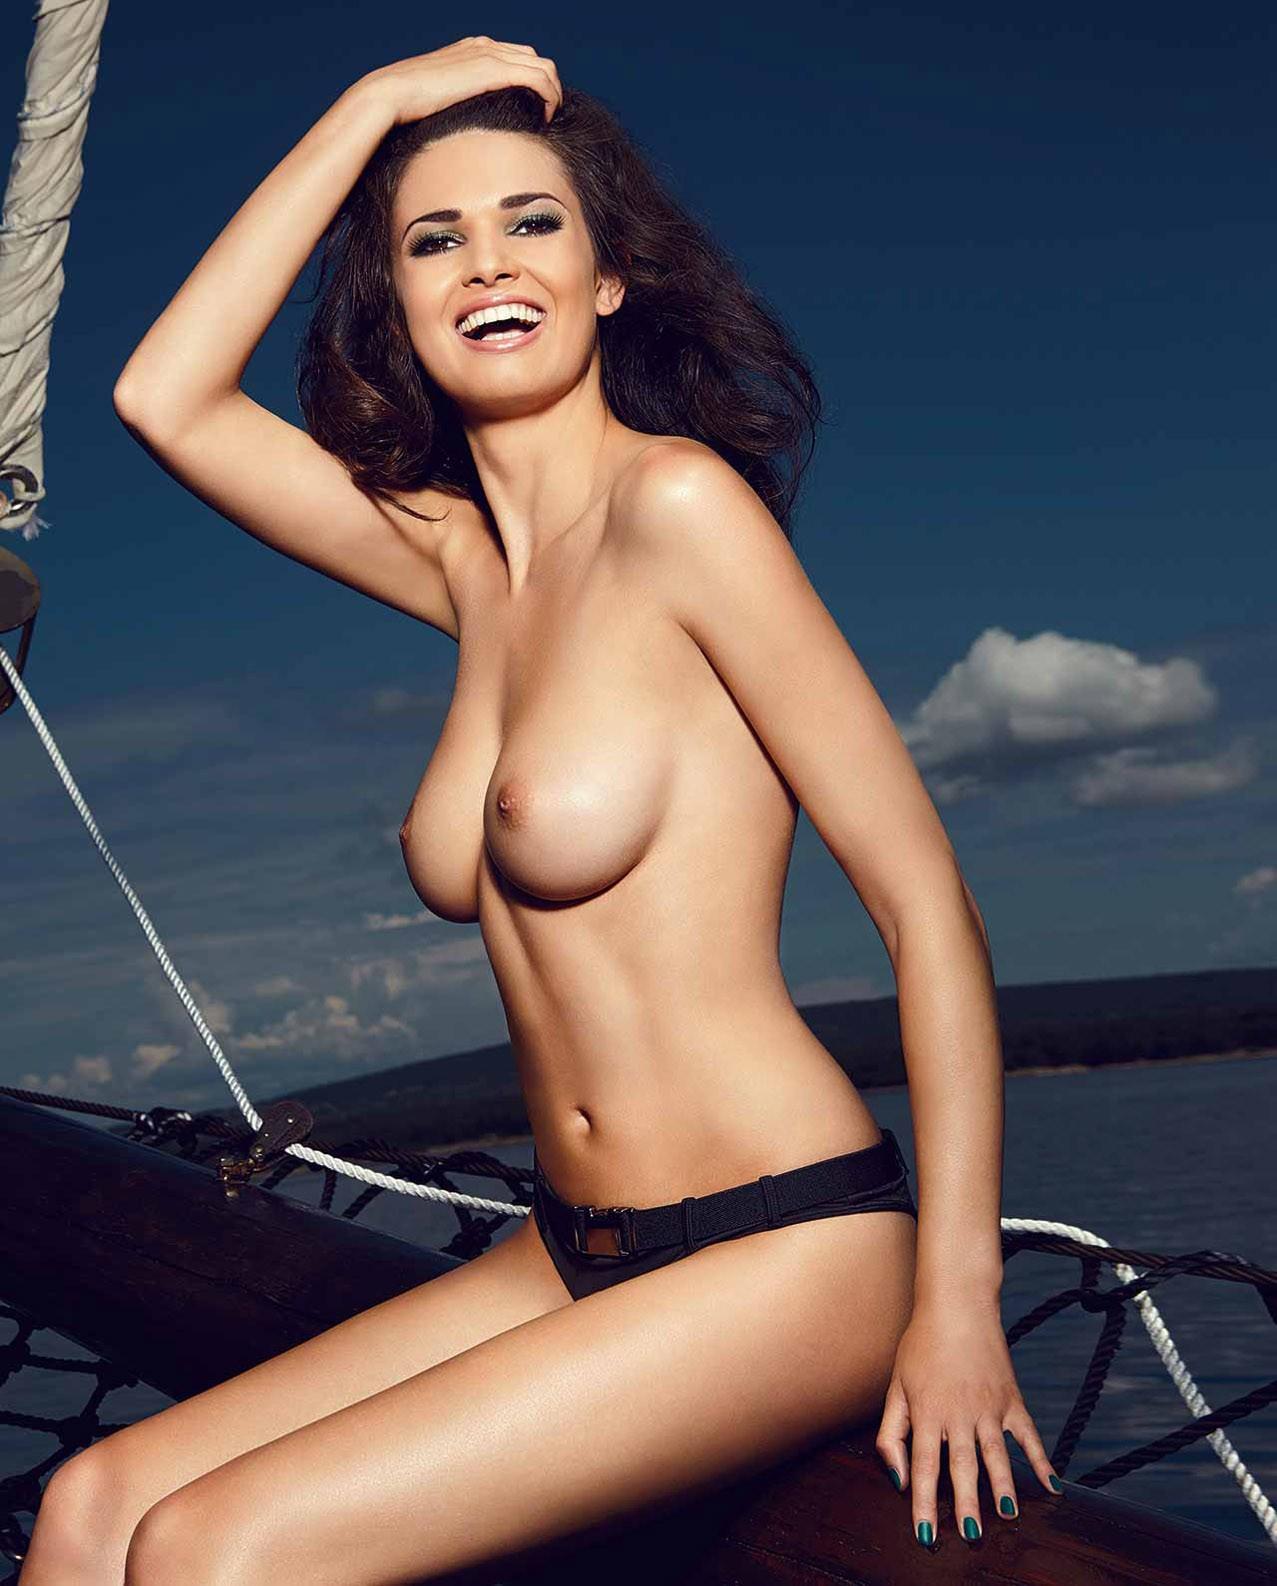 Berner Group erotic calendar 2014 - Inspired by Nature